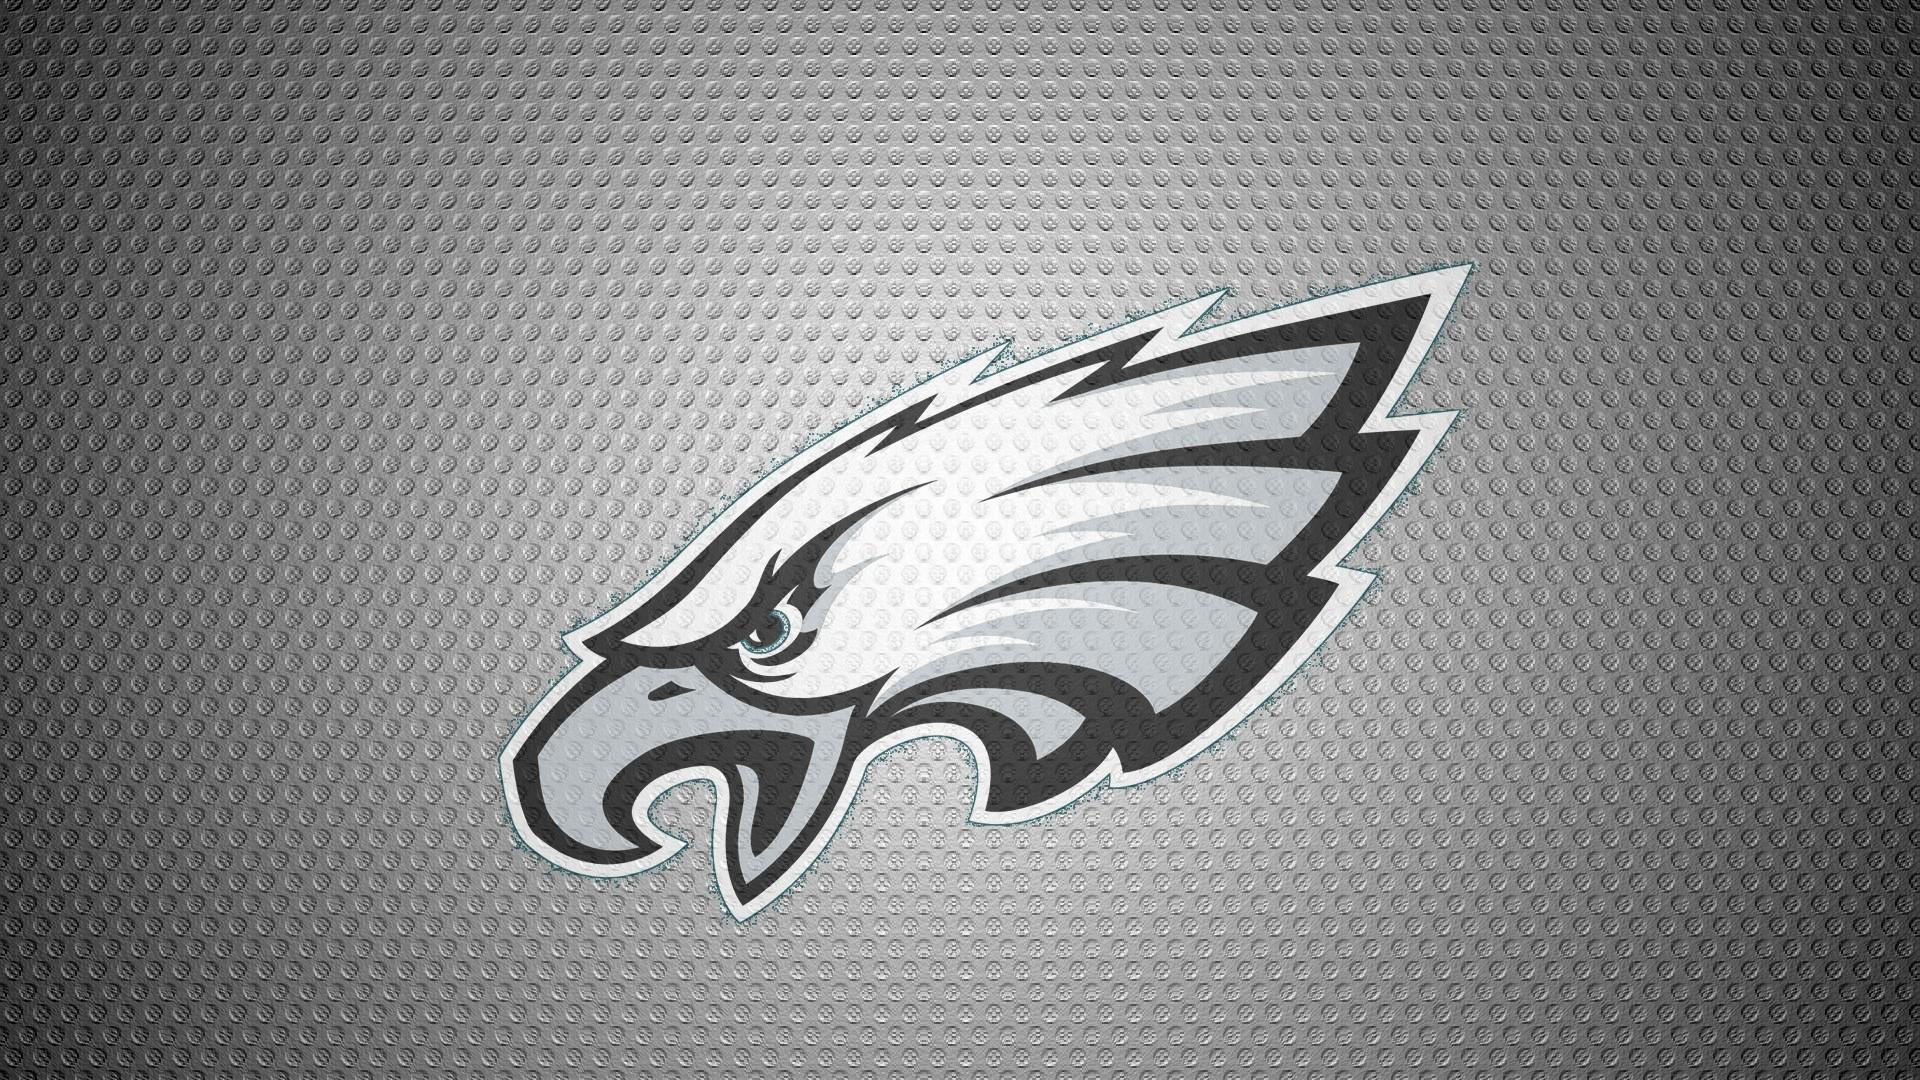 Philadelphia Eagles Wallpaper Hd Philadelphia Eagles Wallpapers Archives Hdwallsource Com